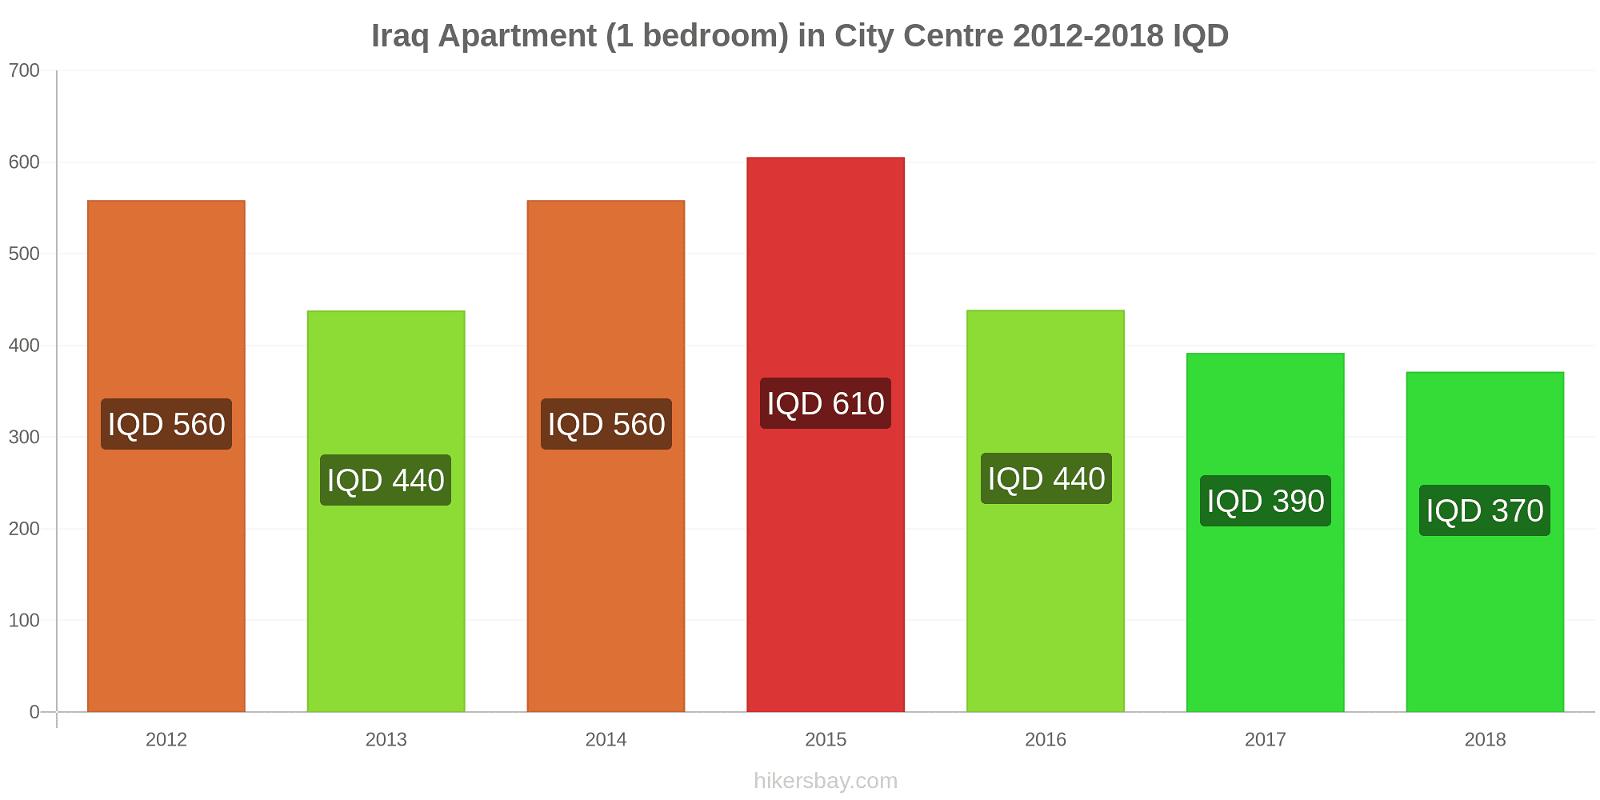 Iraq price changes Apartment (1 bedroom) in City Centre hikersbay.com